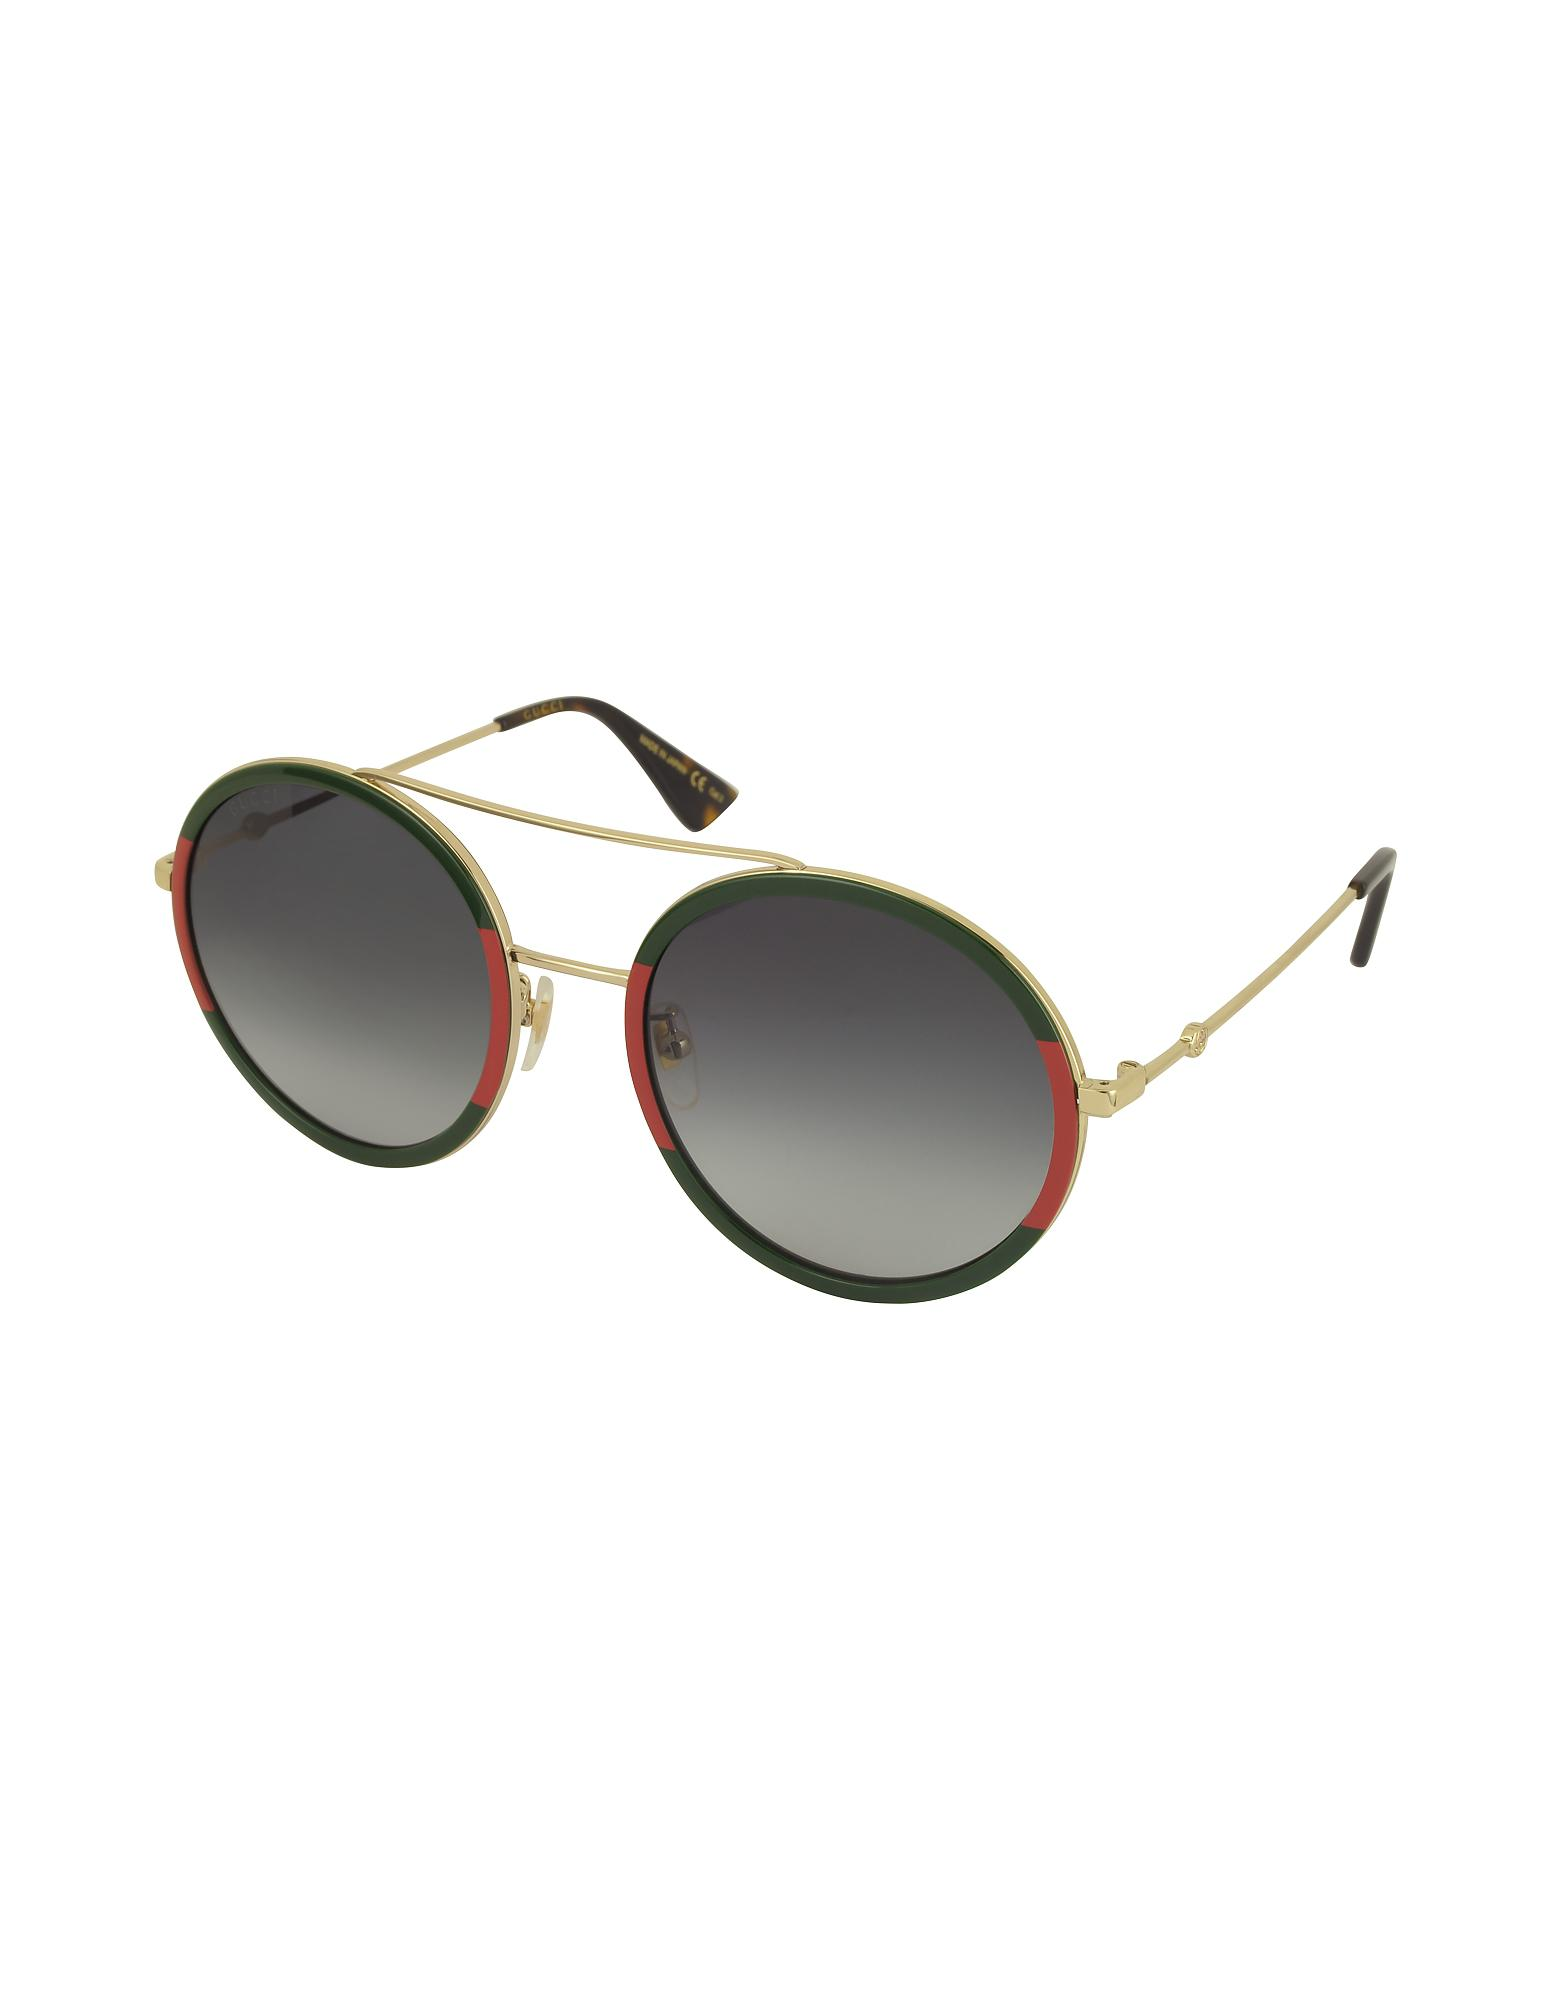 477eec58389 Lyst - Gucci Round-frame Metal Sunglasses in Metallic